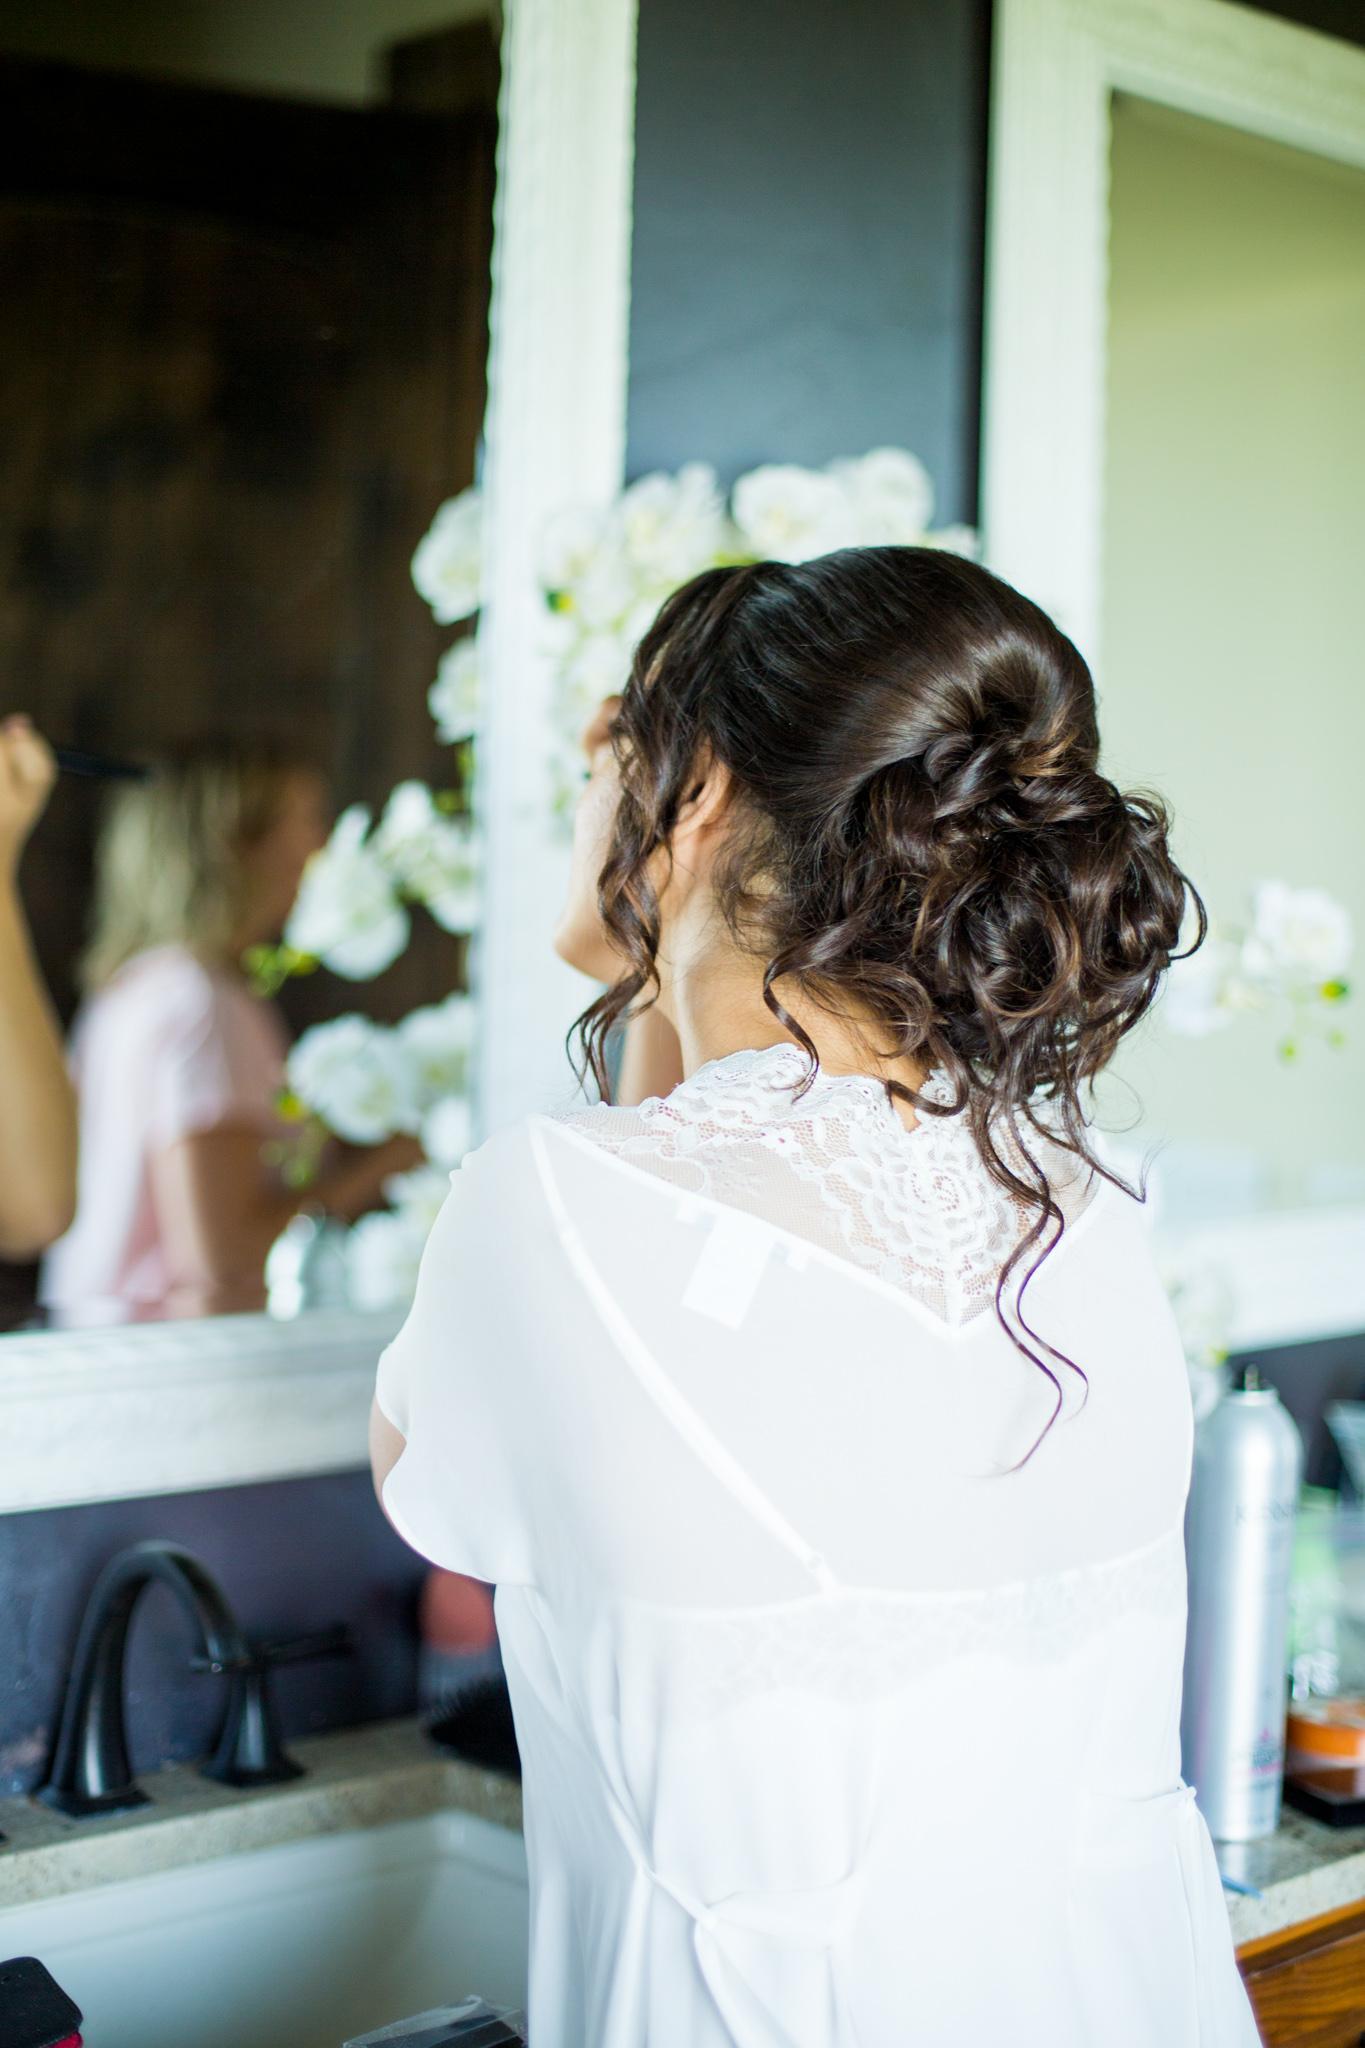 Olga_janni_wedding_090917_WEBSIZE (2 of 704).JPG